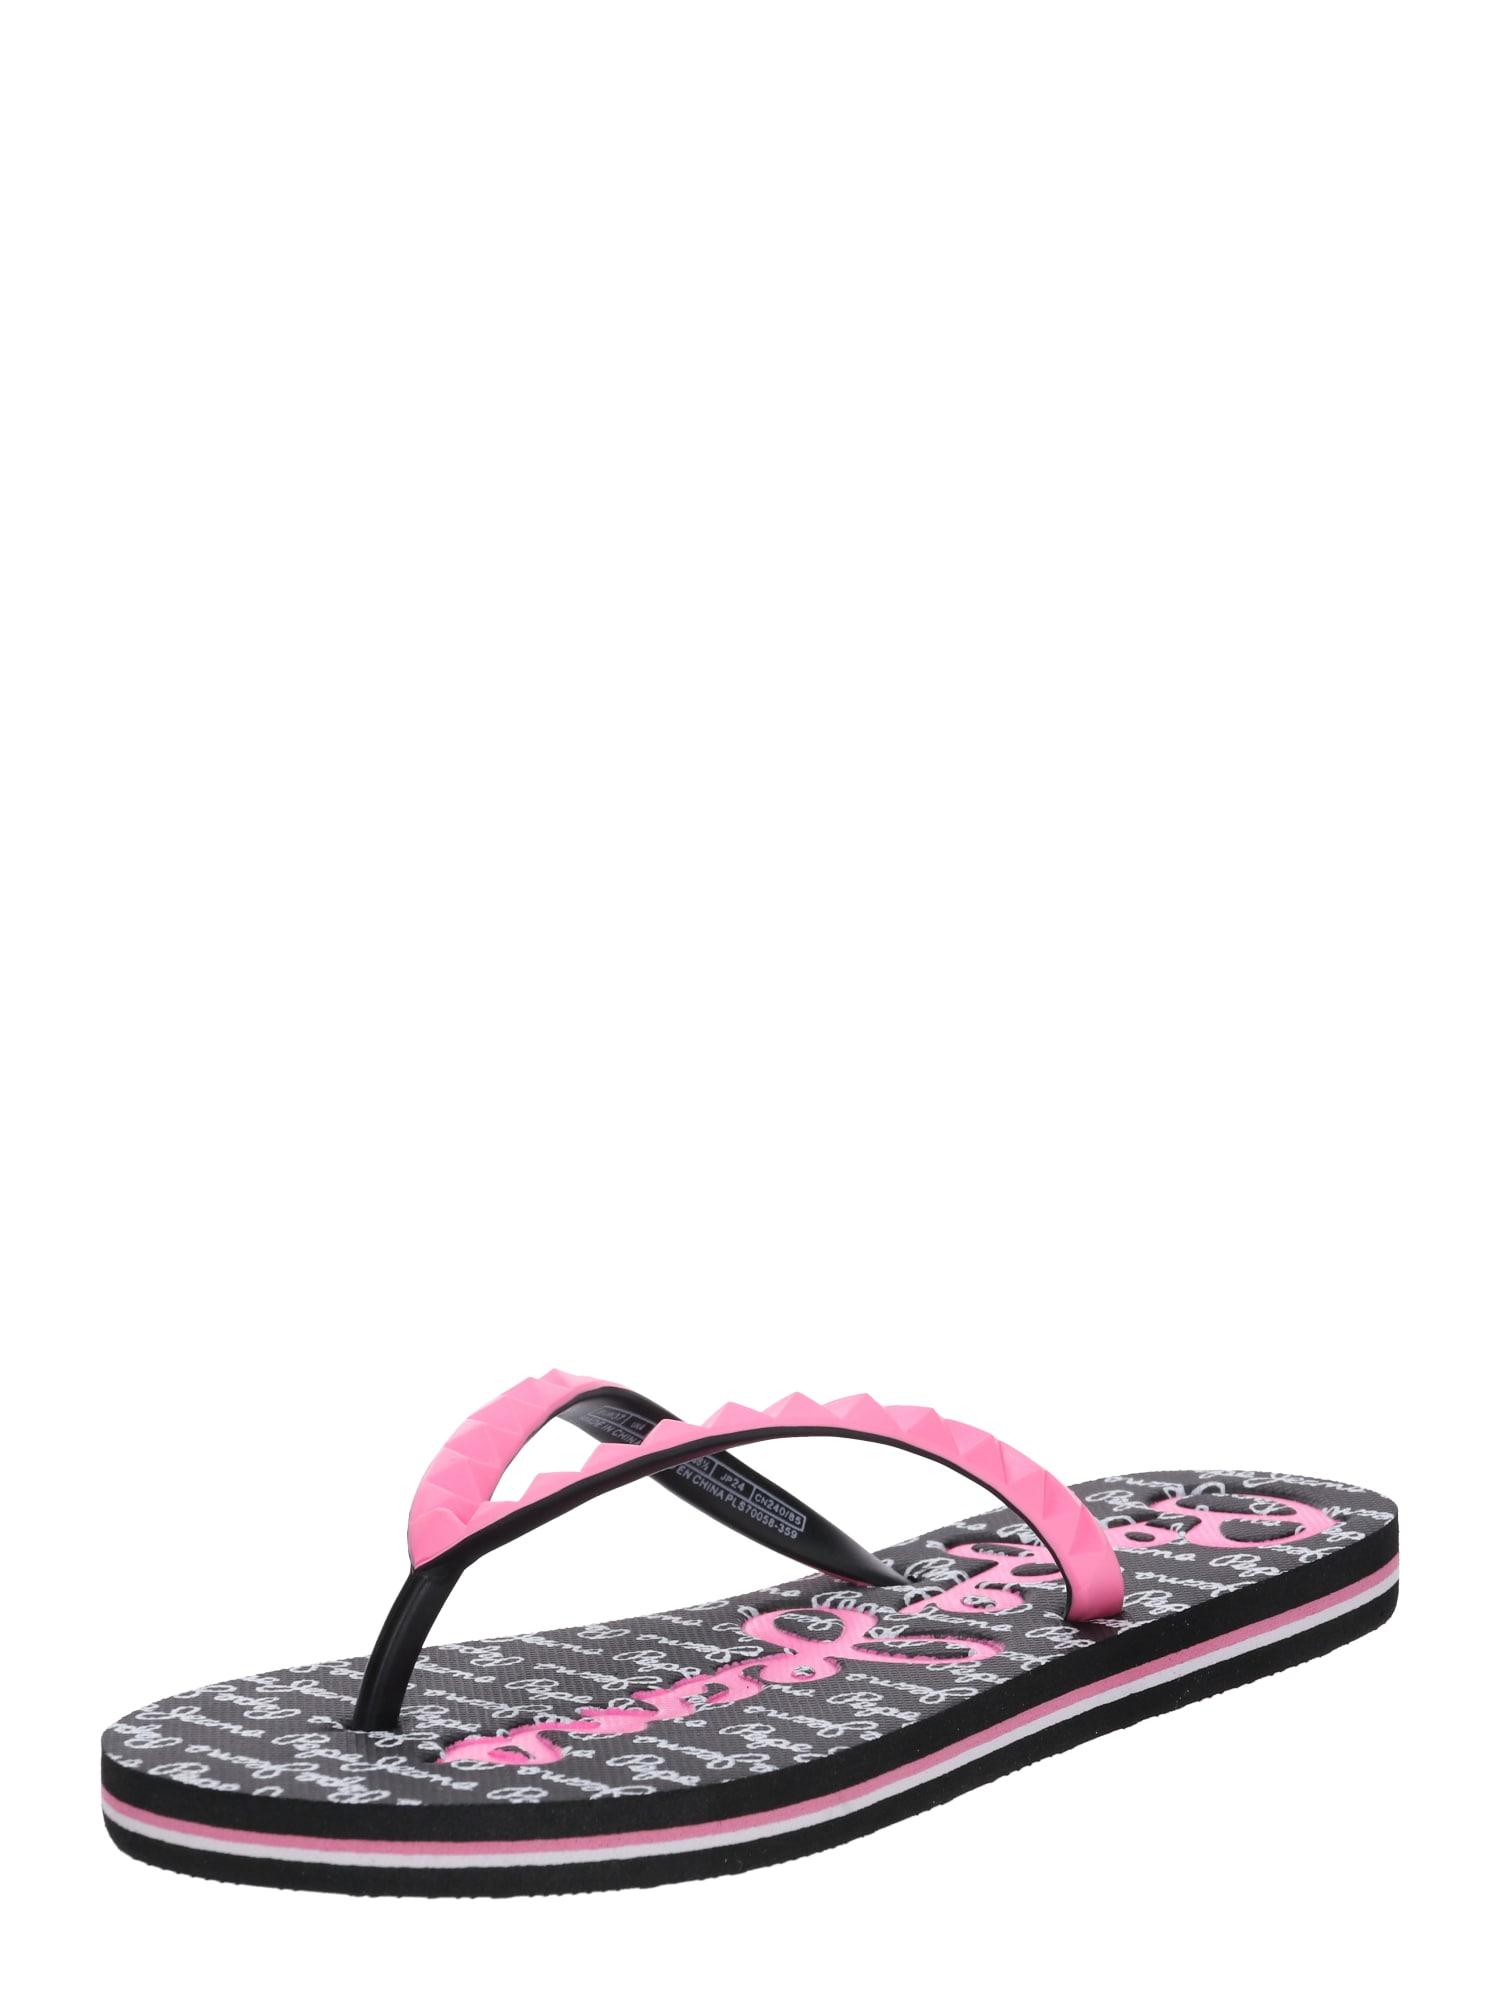 Pantofle RAKE LOGO pink černá Pepe Jeans